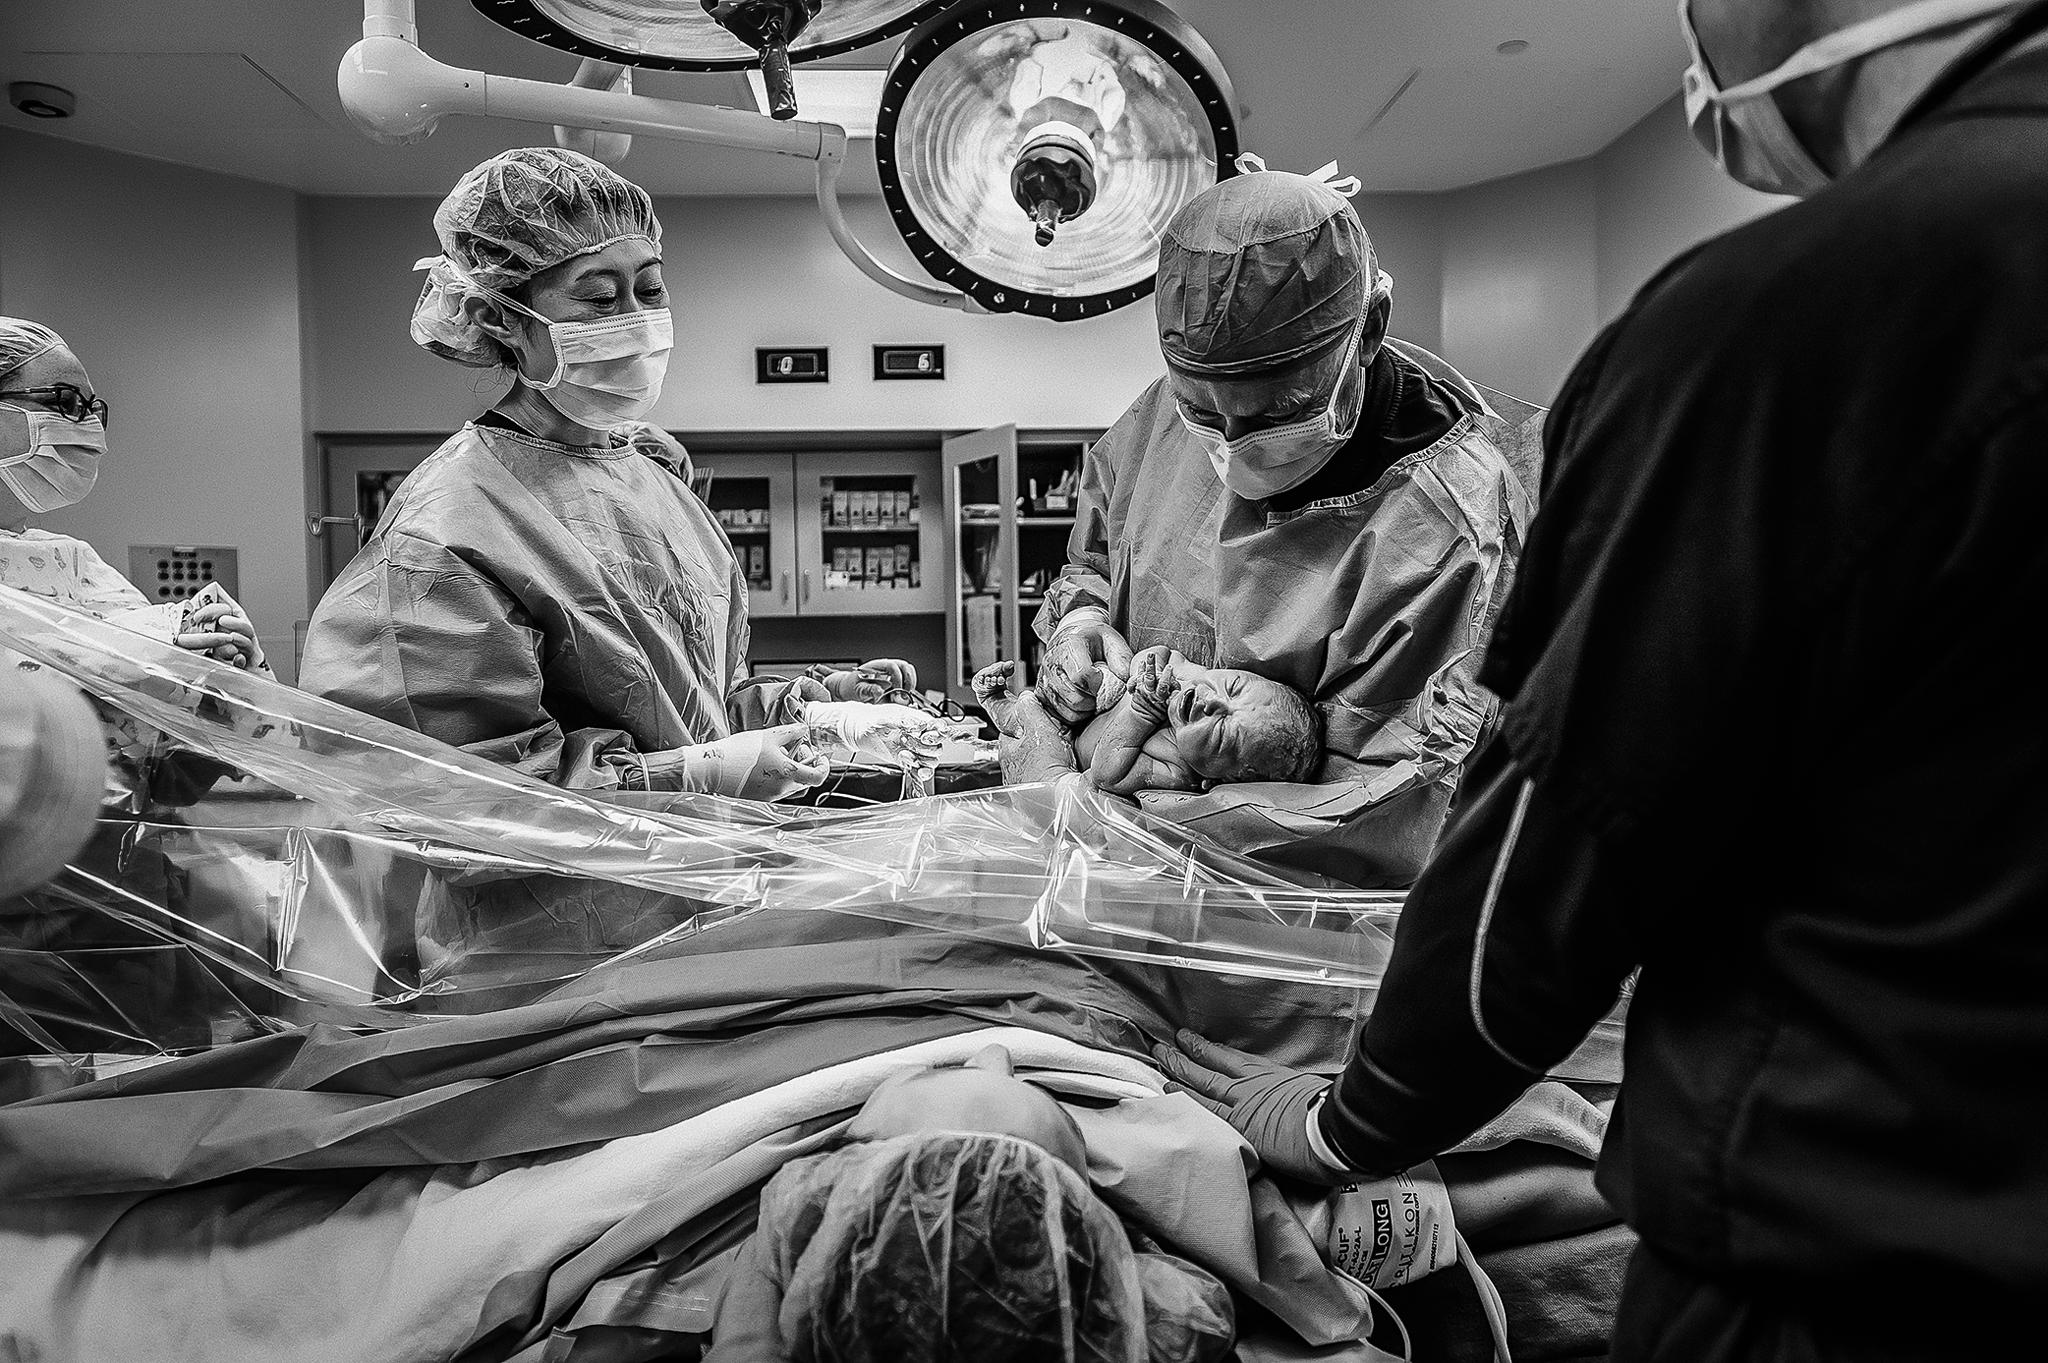 cesarean birth photo